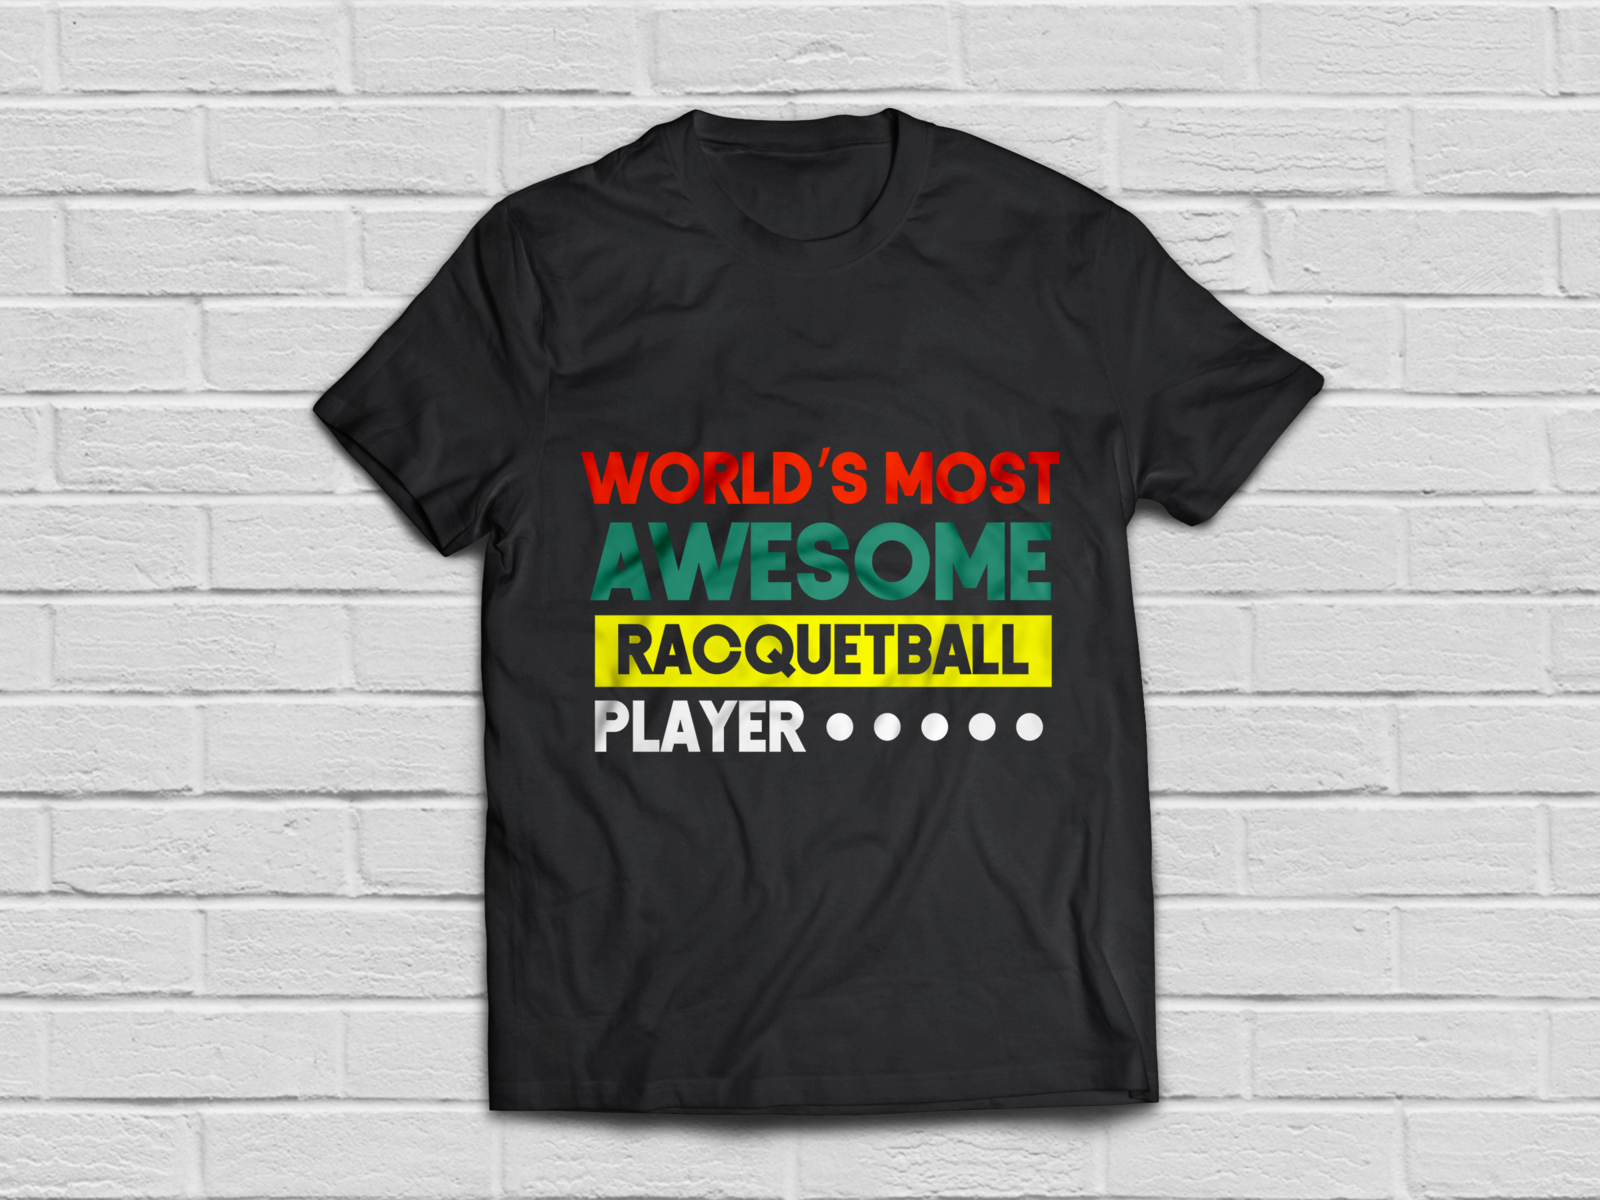 Racquetball player shirt - Funny racquetball clothing - T ...